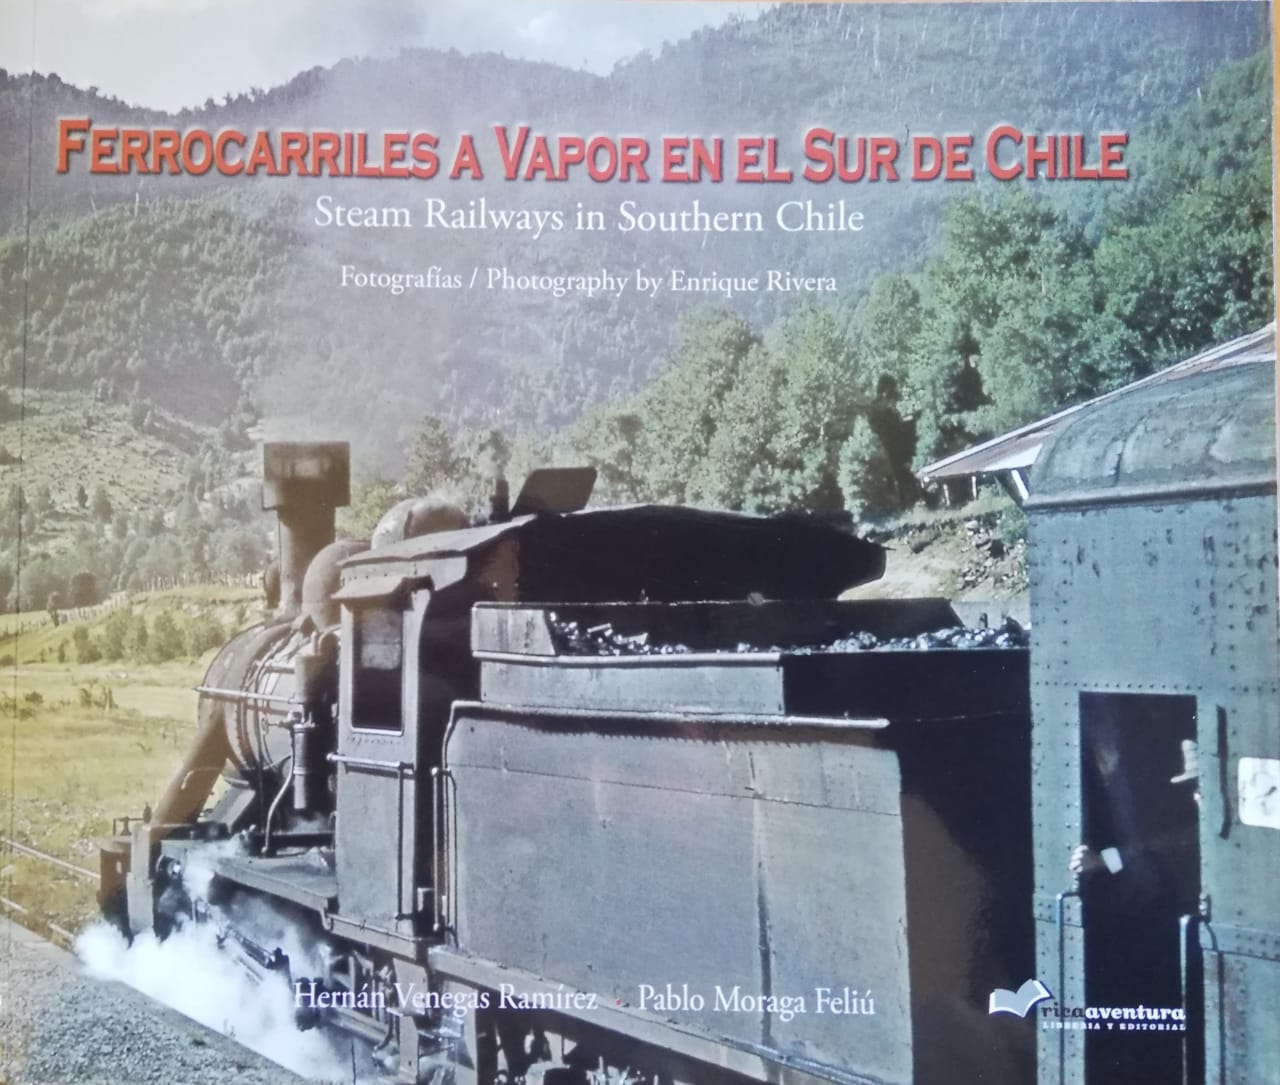 FERROCARRILES A VAPOR EN EL SUR DE CHILE